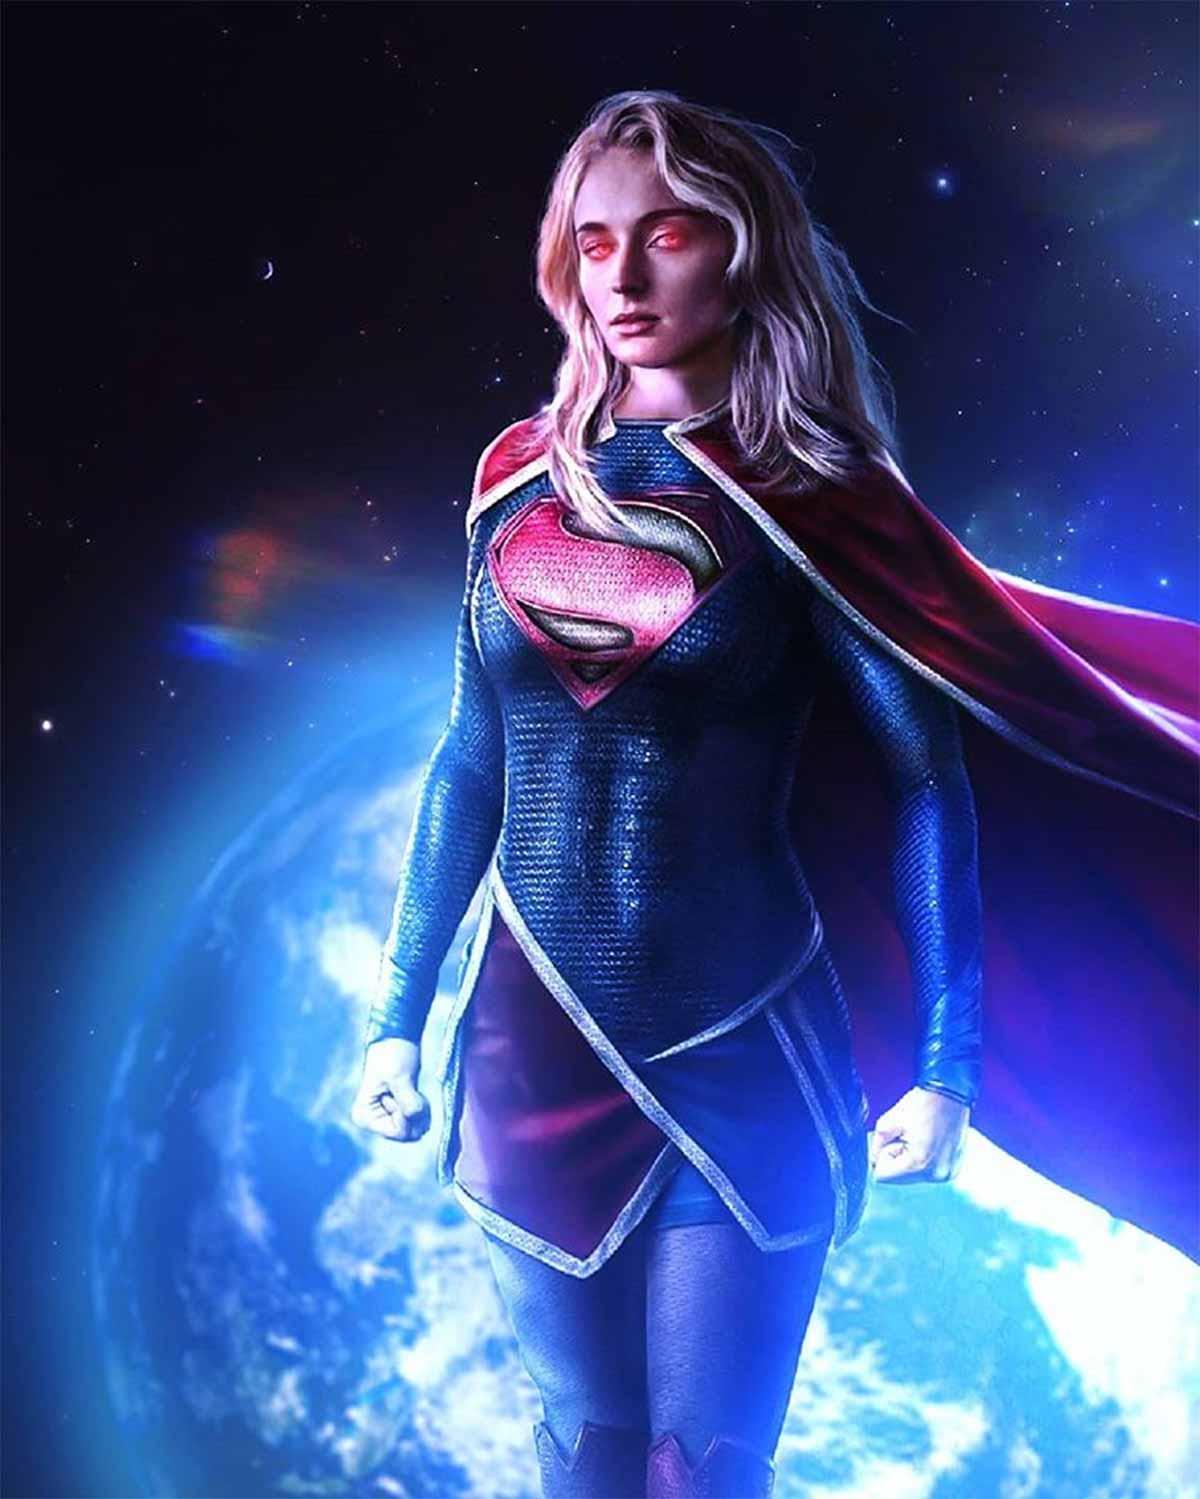 Fan Art of Sophie Turner as Supergirl